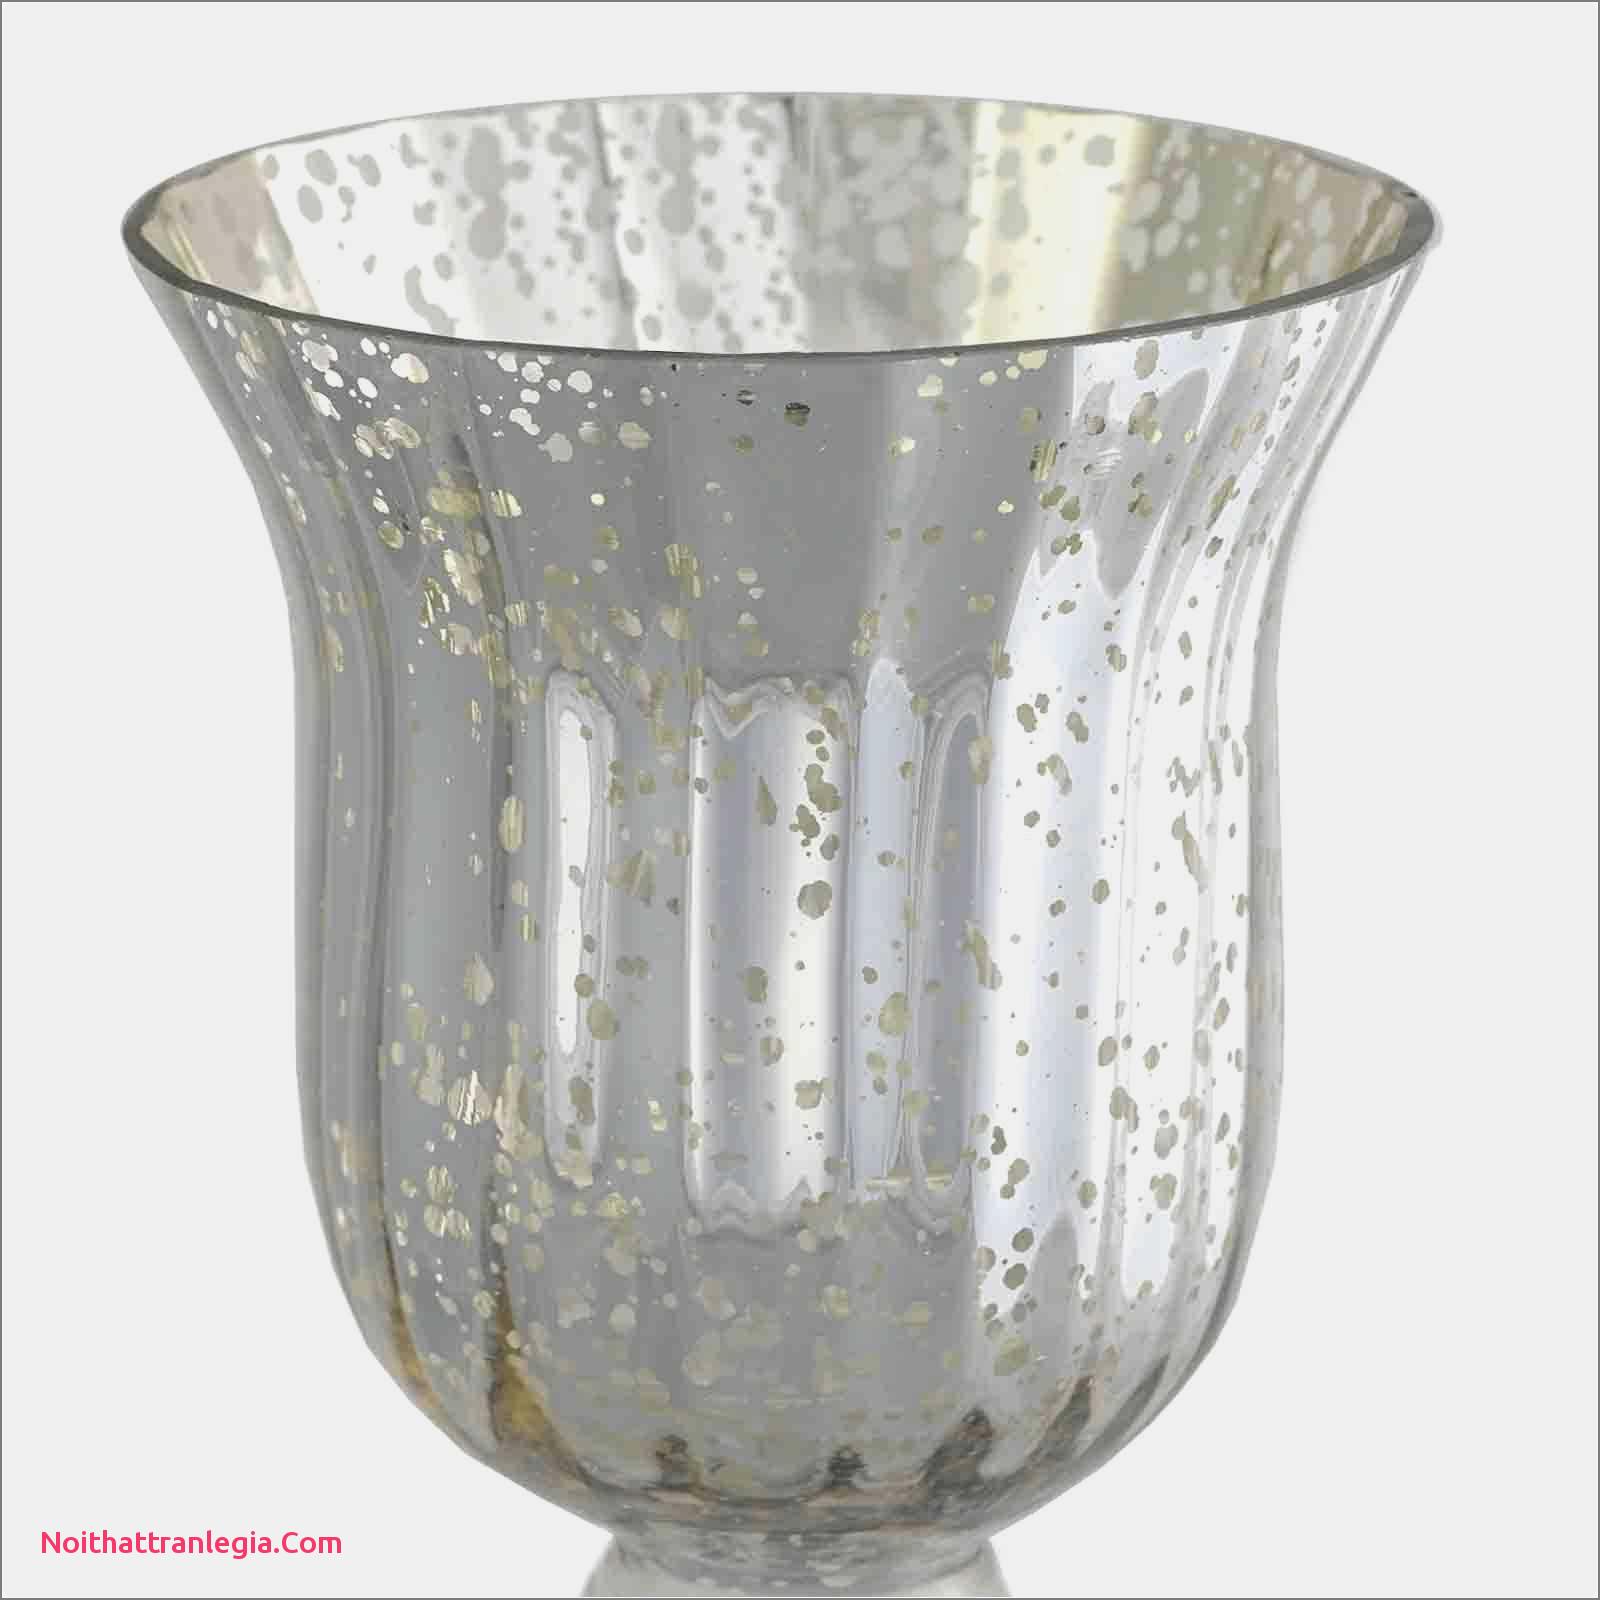 Glass Candy Vases Of 20 Wedding Vases Noithattranlegia Vases Design Inside Wedding Guest Gift Ideas Inspirational Candles for Wedding Favors Superb Pe S5h Vases Candle Vase I